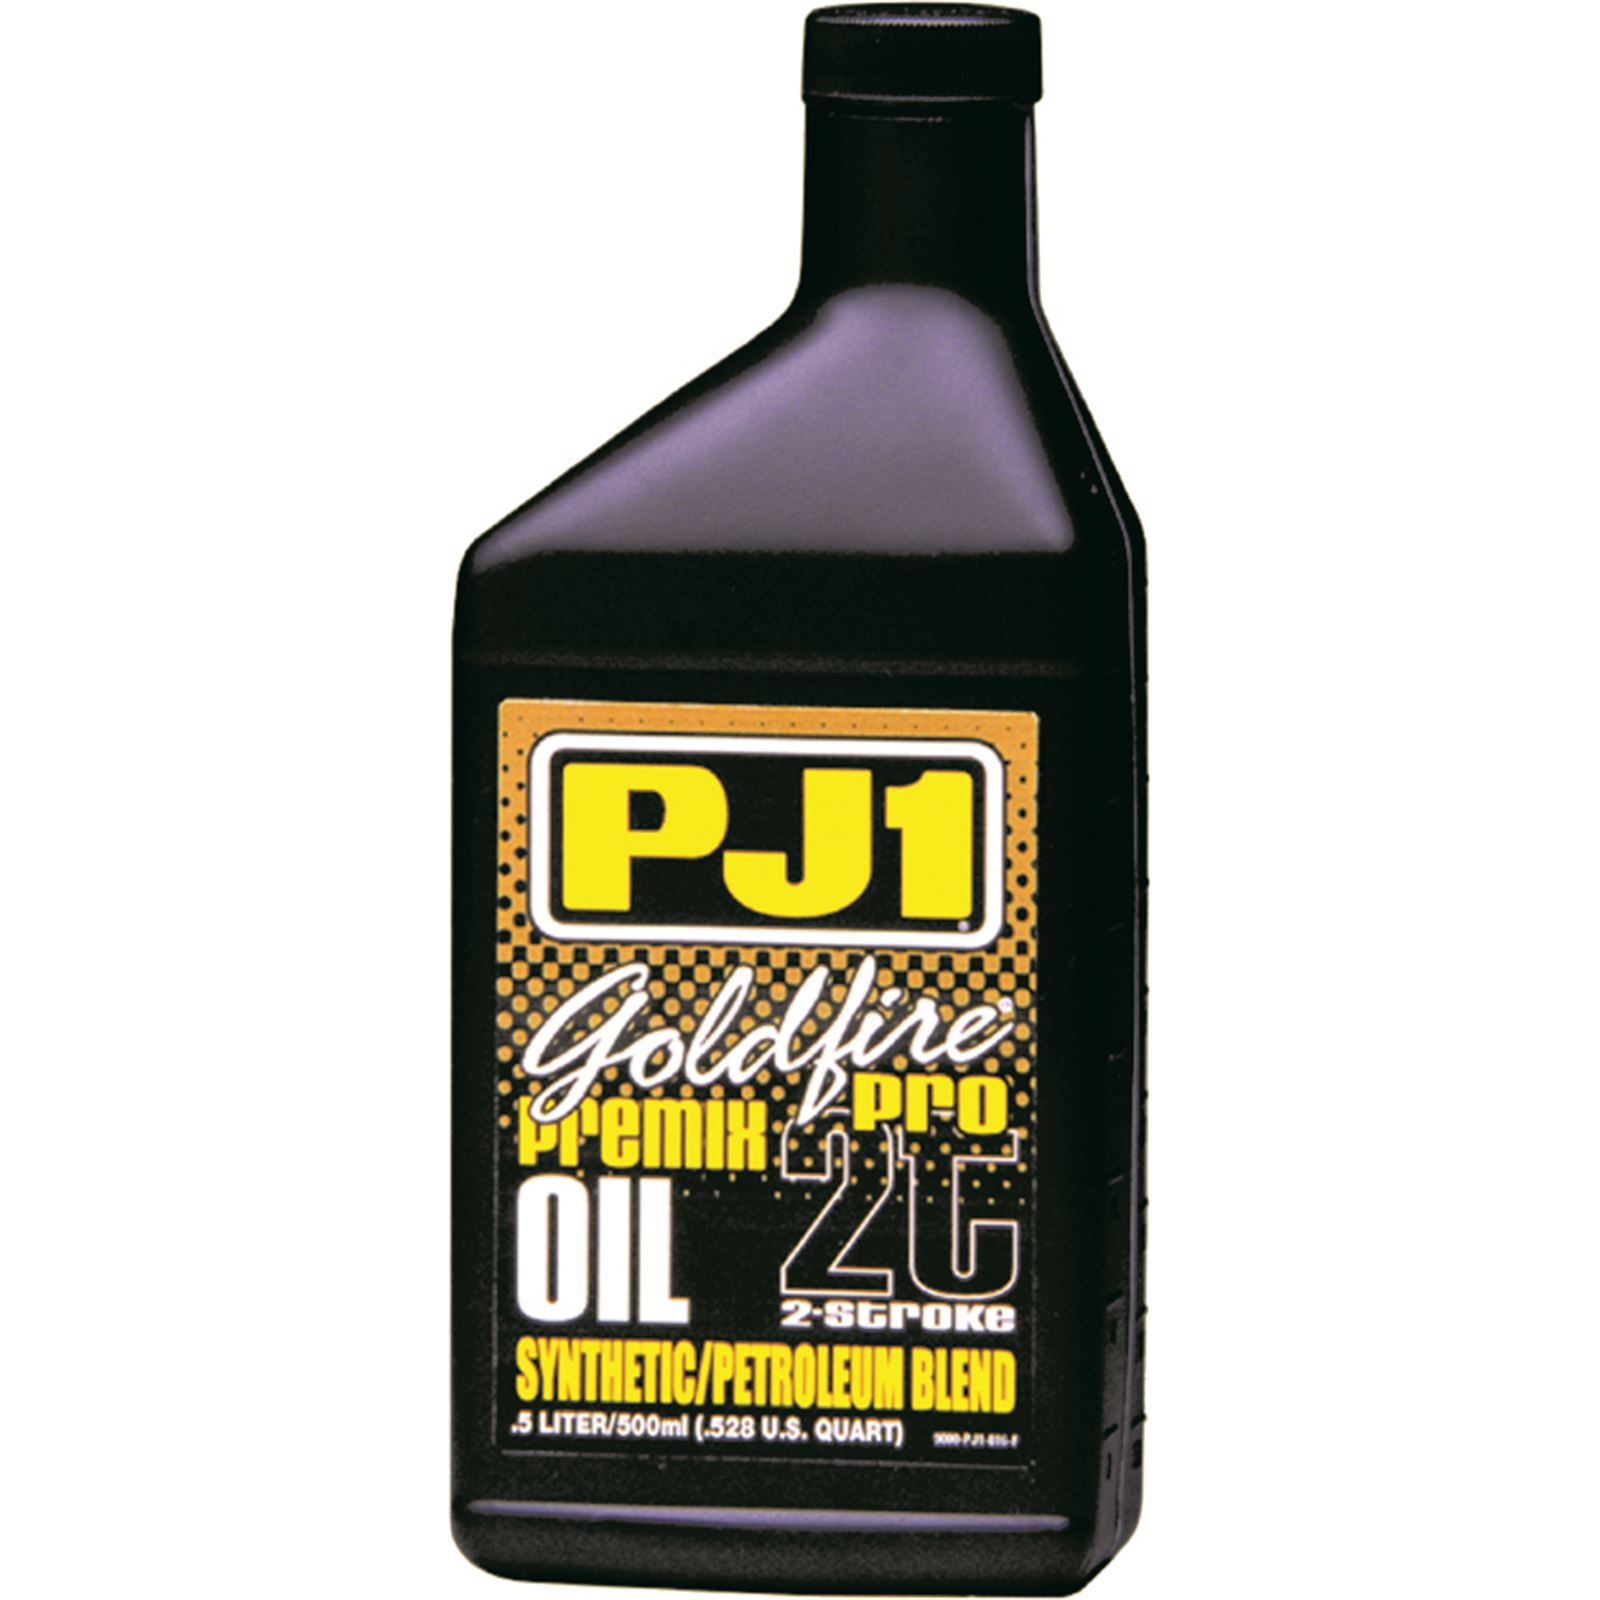 PJ1 Goldfire Pro 2-Stroke Premix